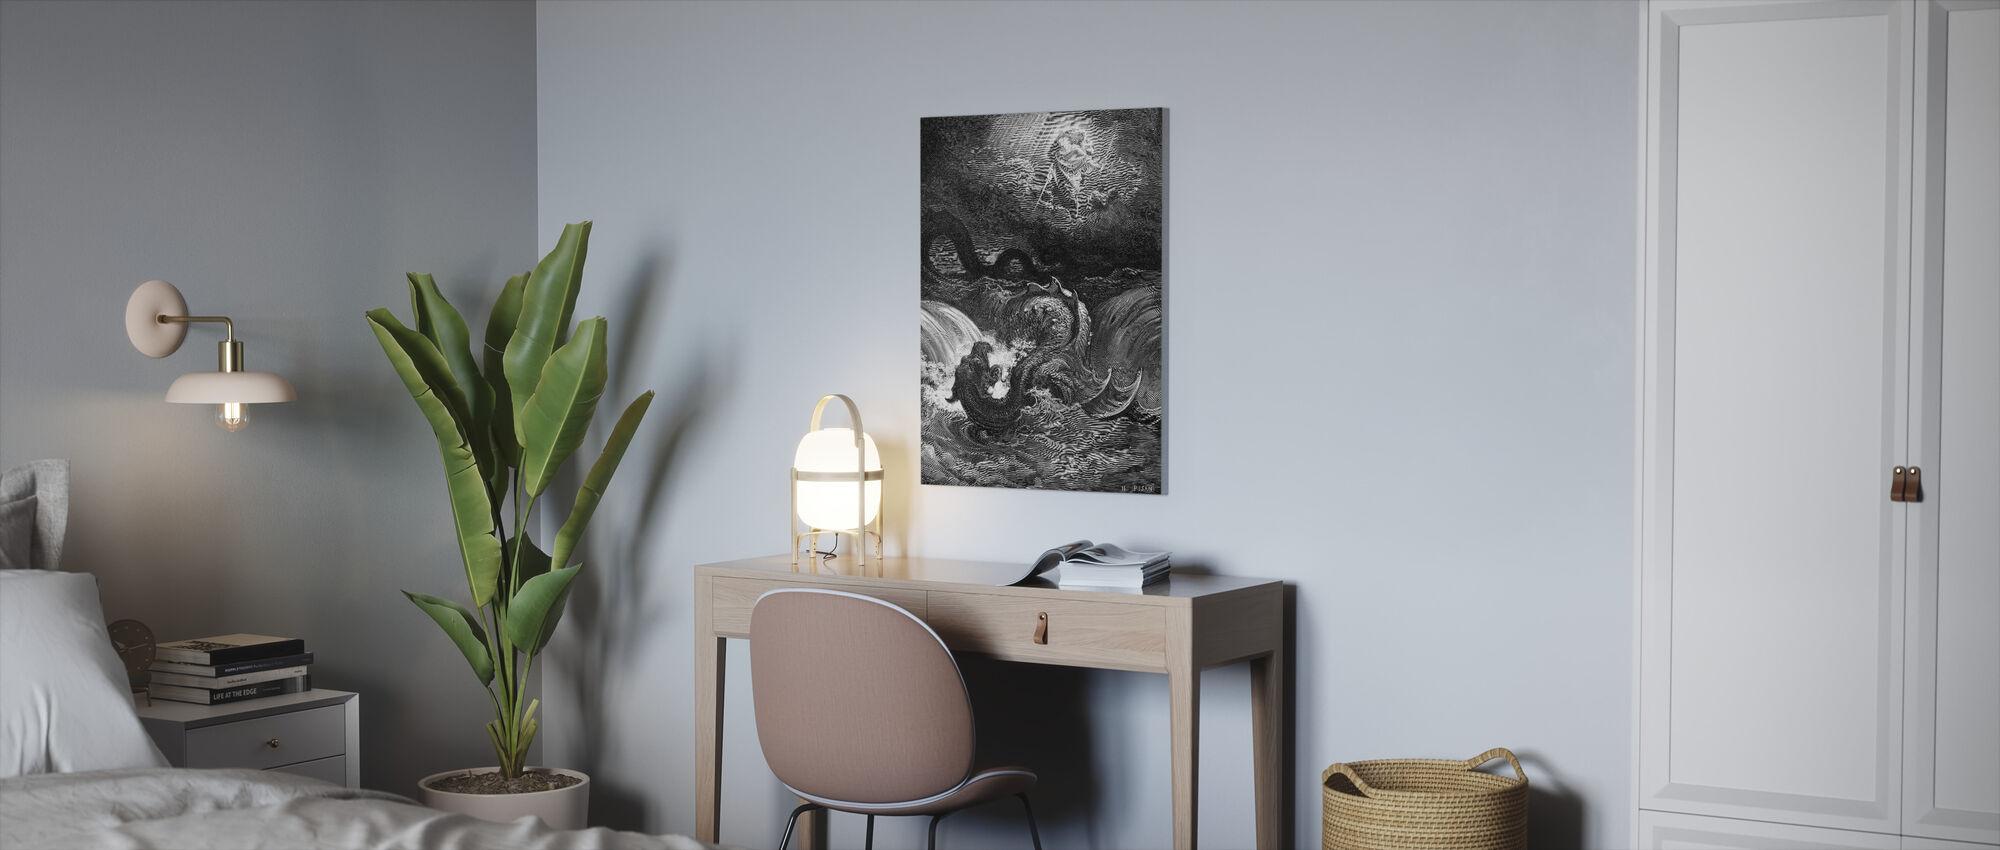 Esaias Syn - Gustave Dore - Canvastavla - Kontor